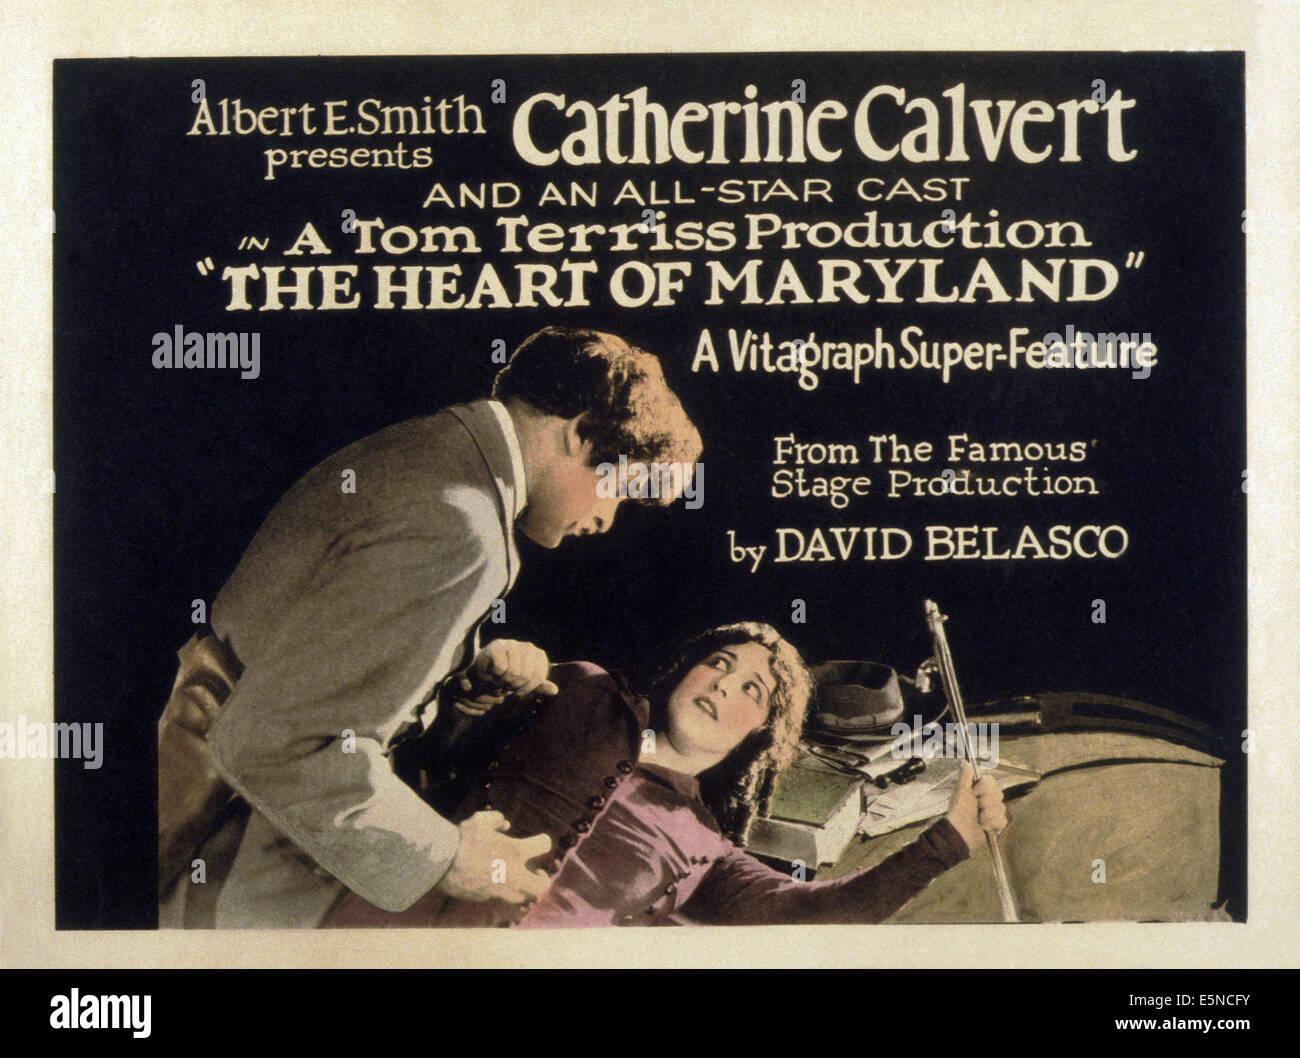 Catherine Calvert